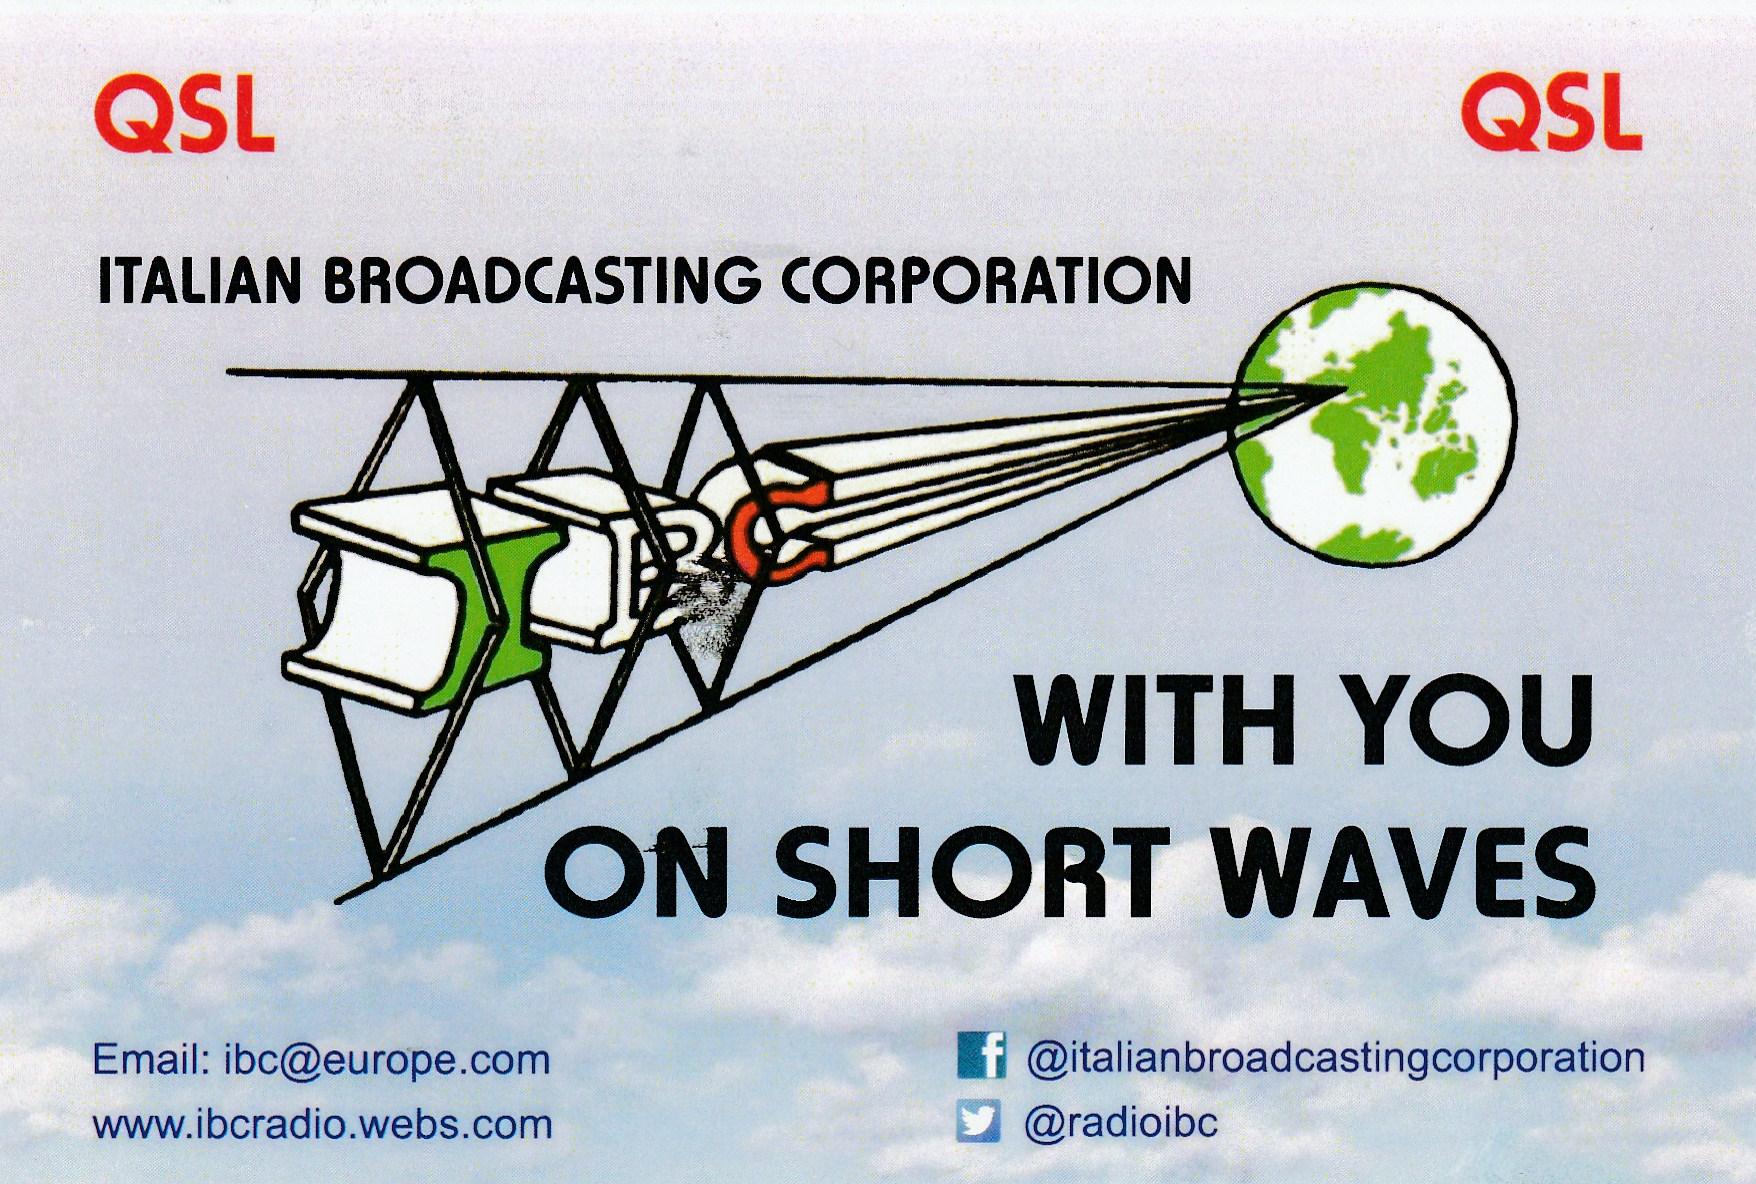 QSL IBC Italian Broadcasting Corporation 754903IMG201701030005